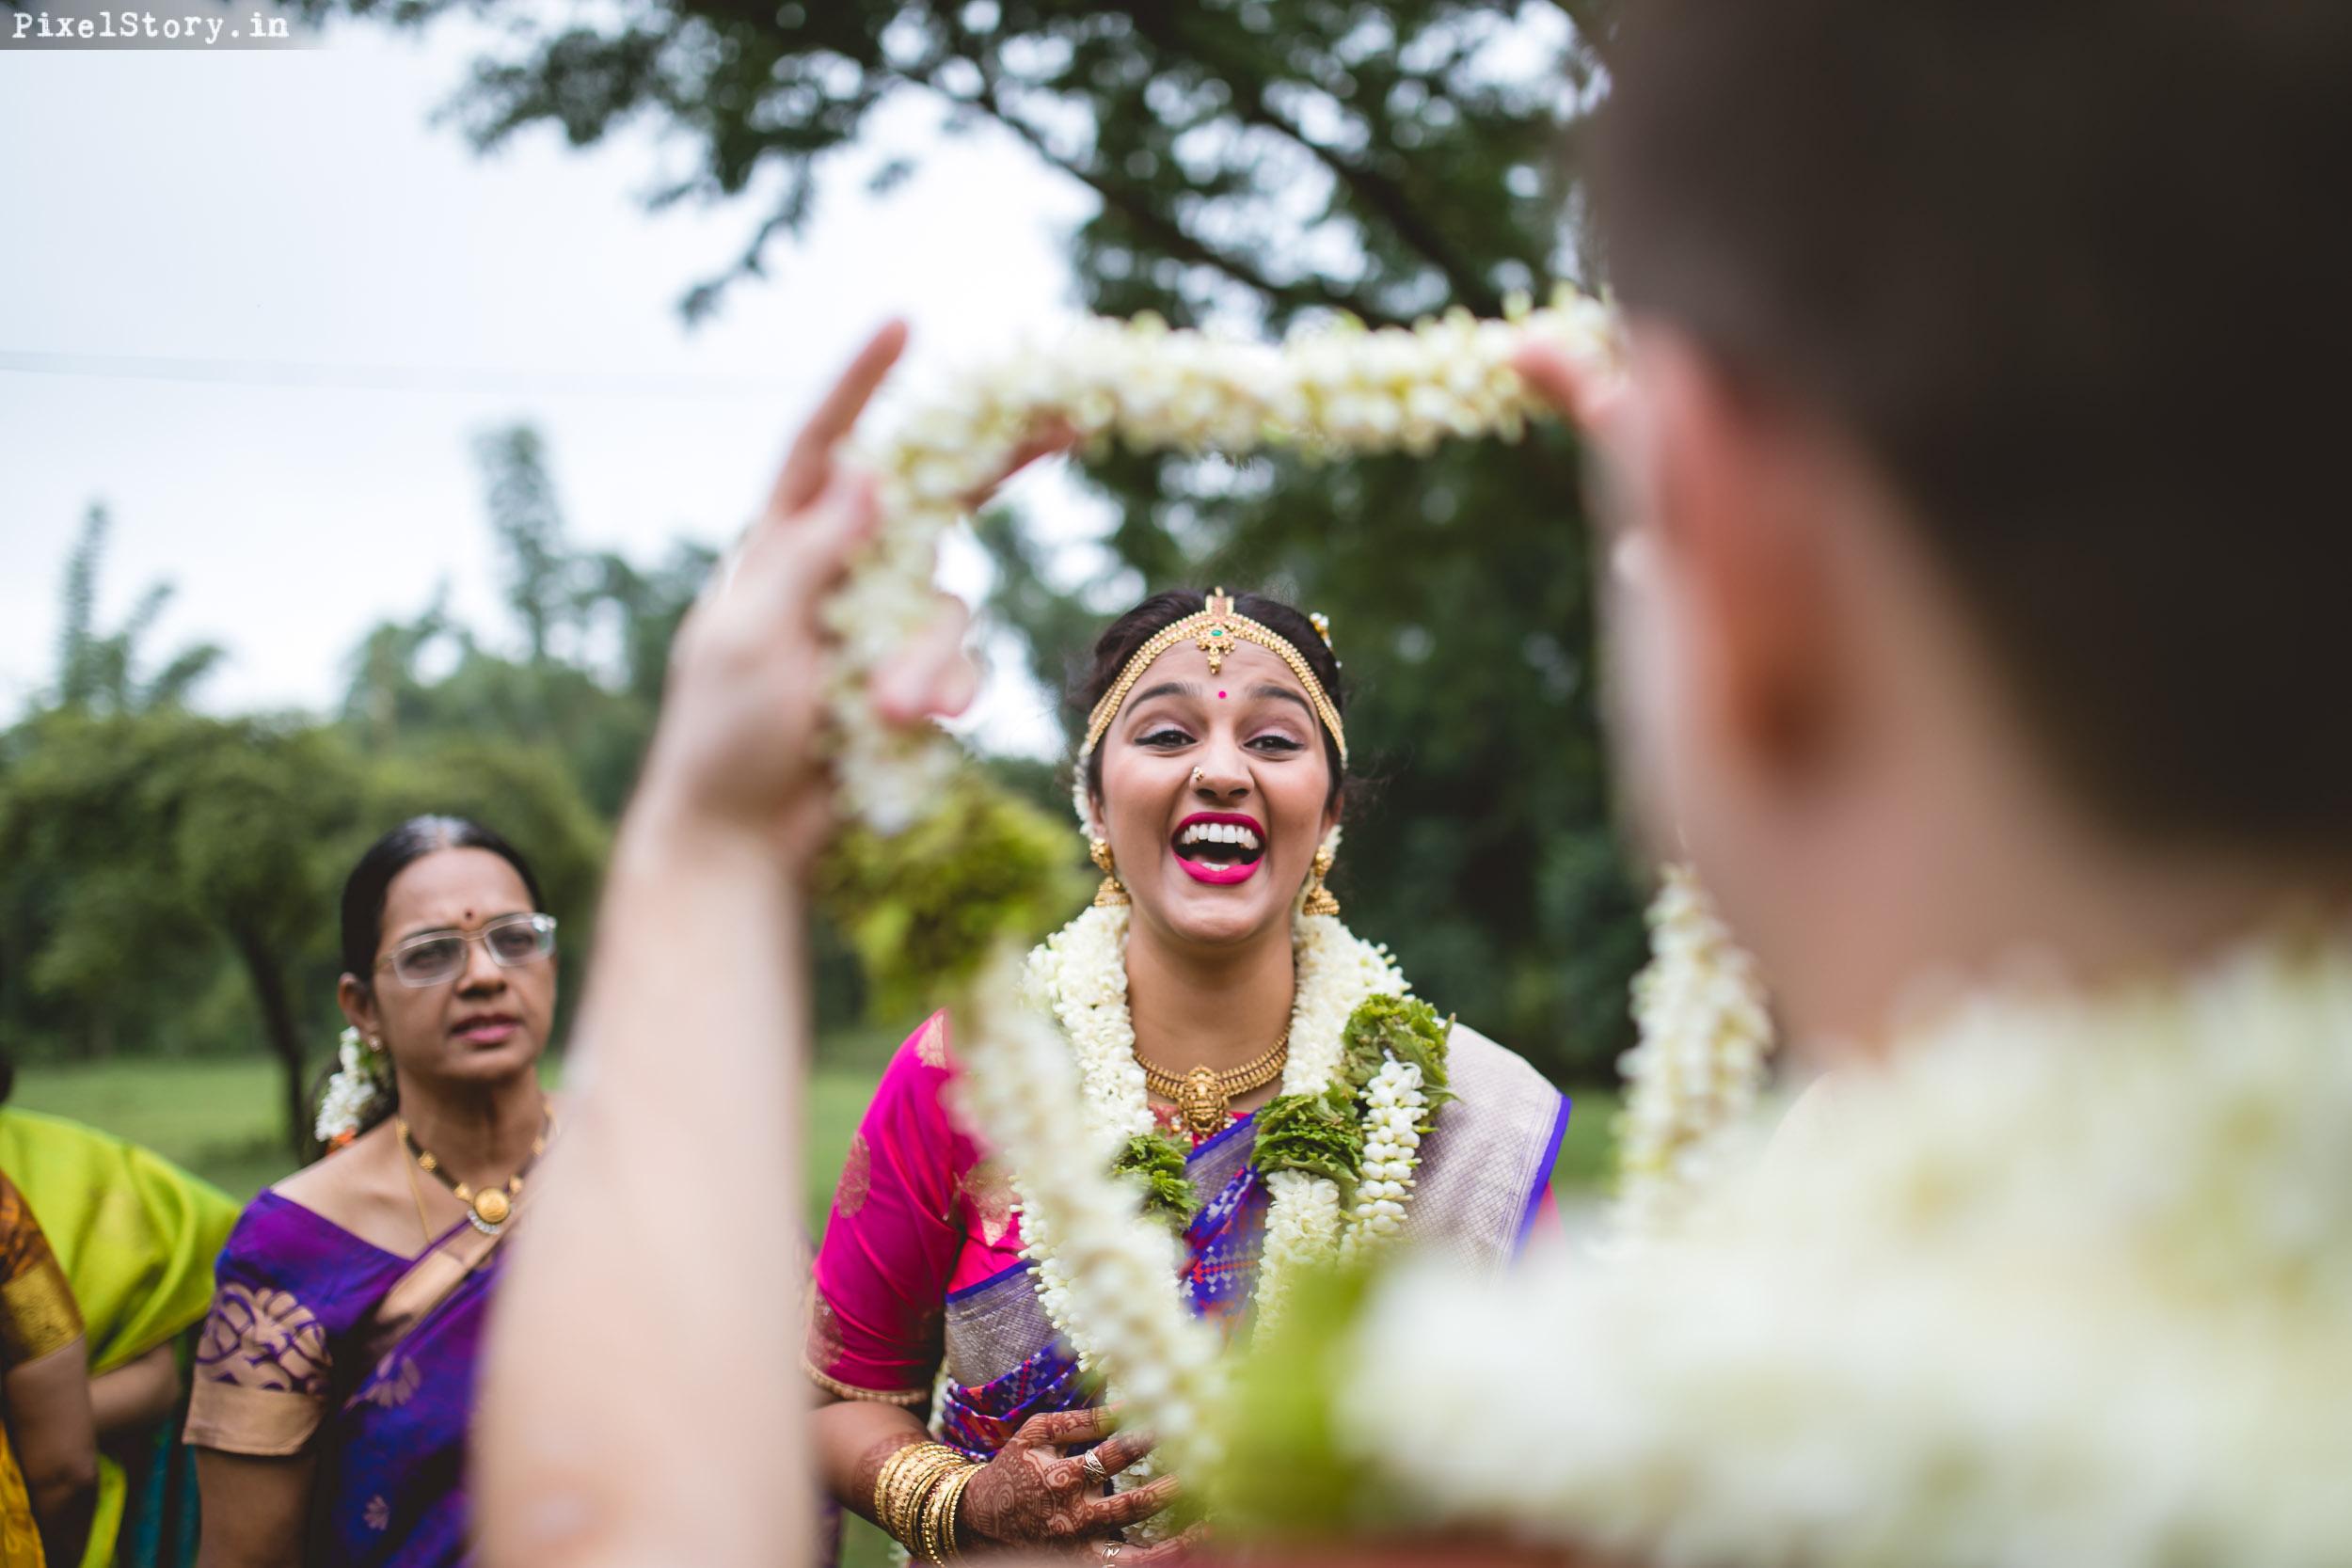 PixelStory-Jungle-Wedding-Photographer-Masinagudi-Indo-French033.jpg